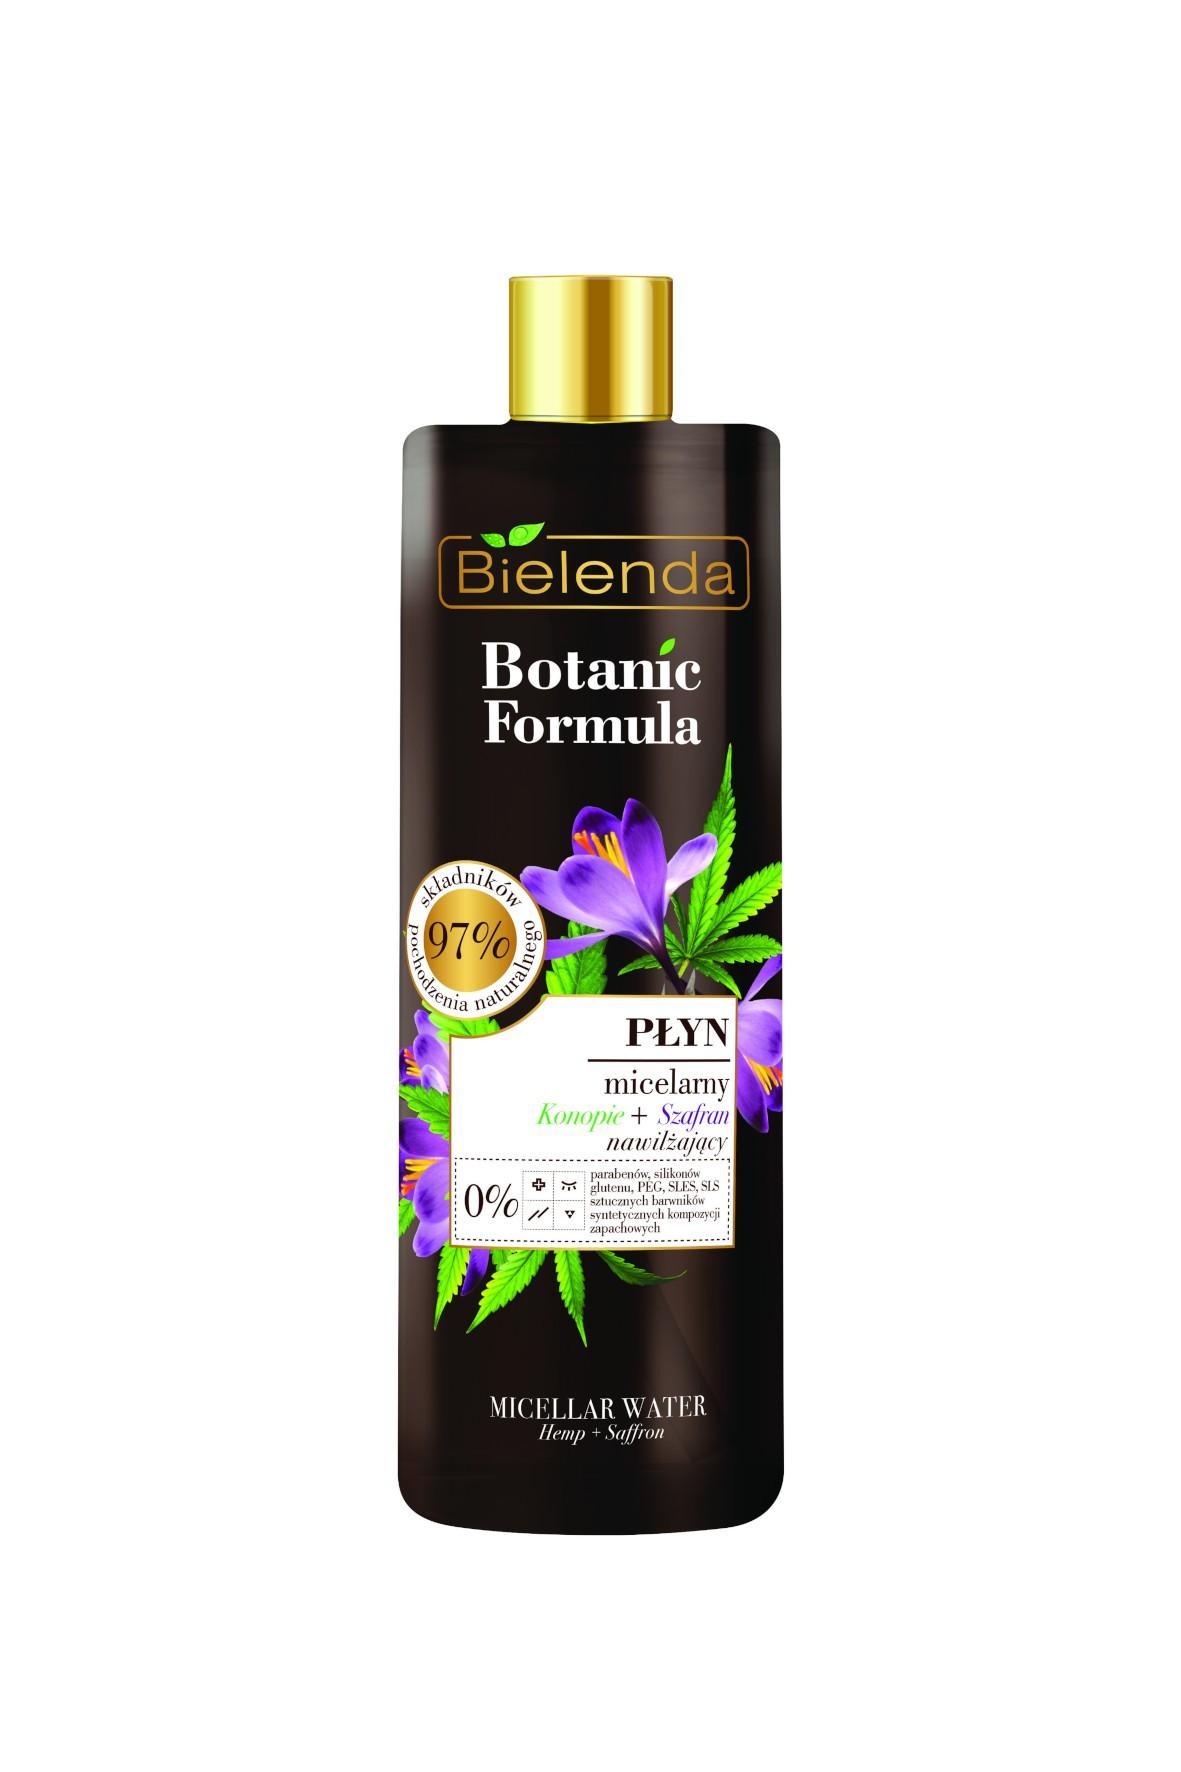 BOTANIC FORMULA Konopie + Szafran Płyn micelarny - 500 ml